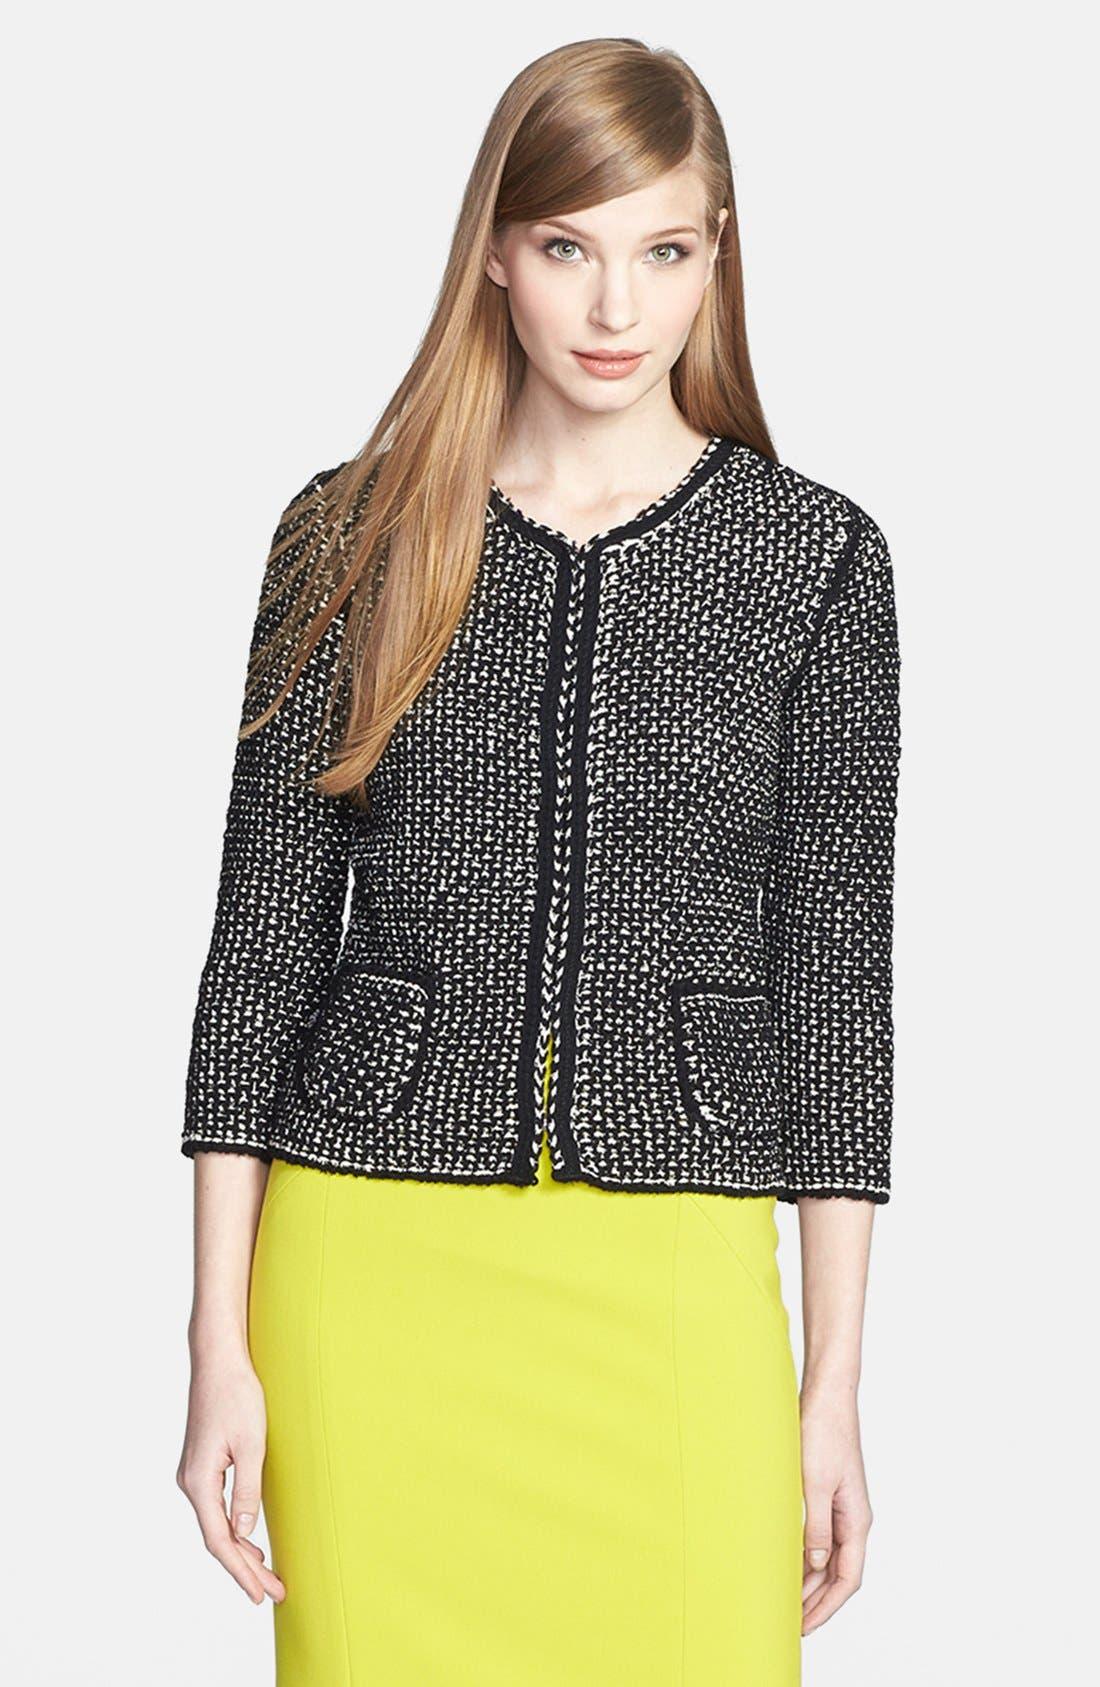 Alternate Image 1 Selected - BOSS HUGO BOSS Cotton Blend Sweater Jacket